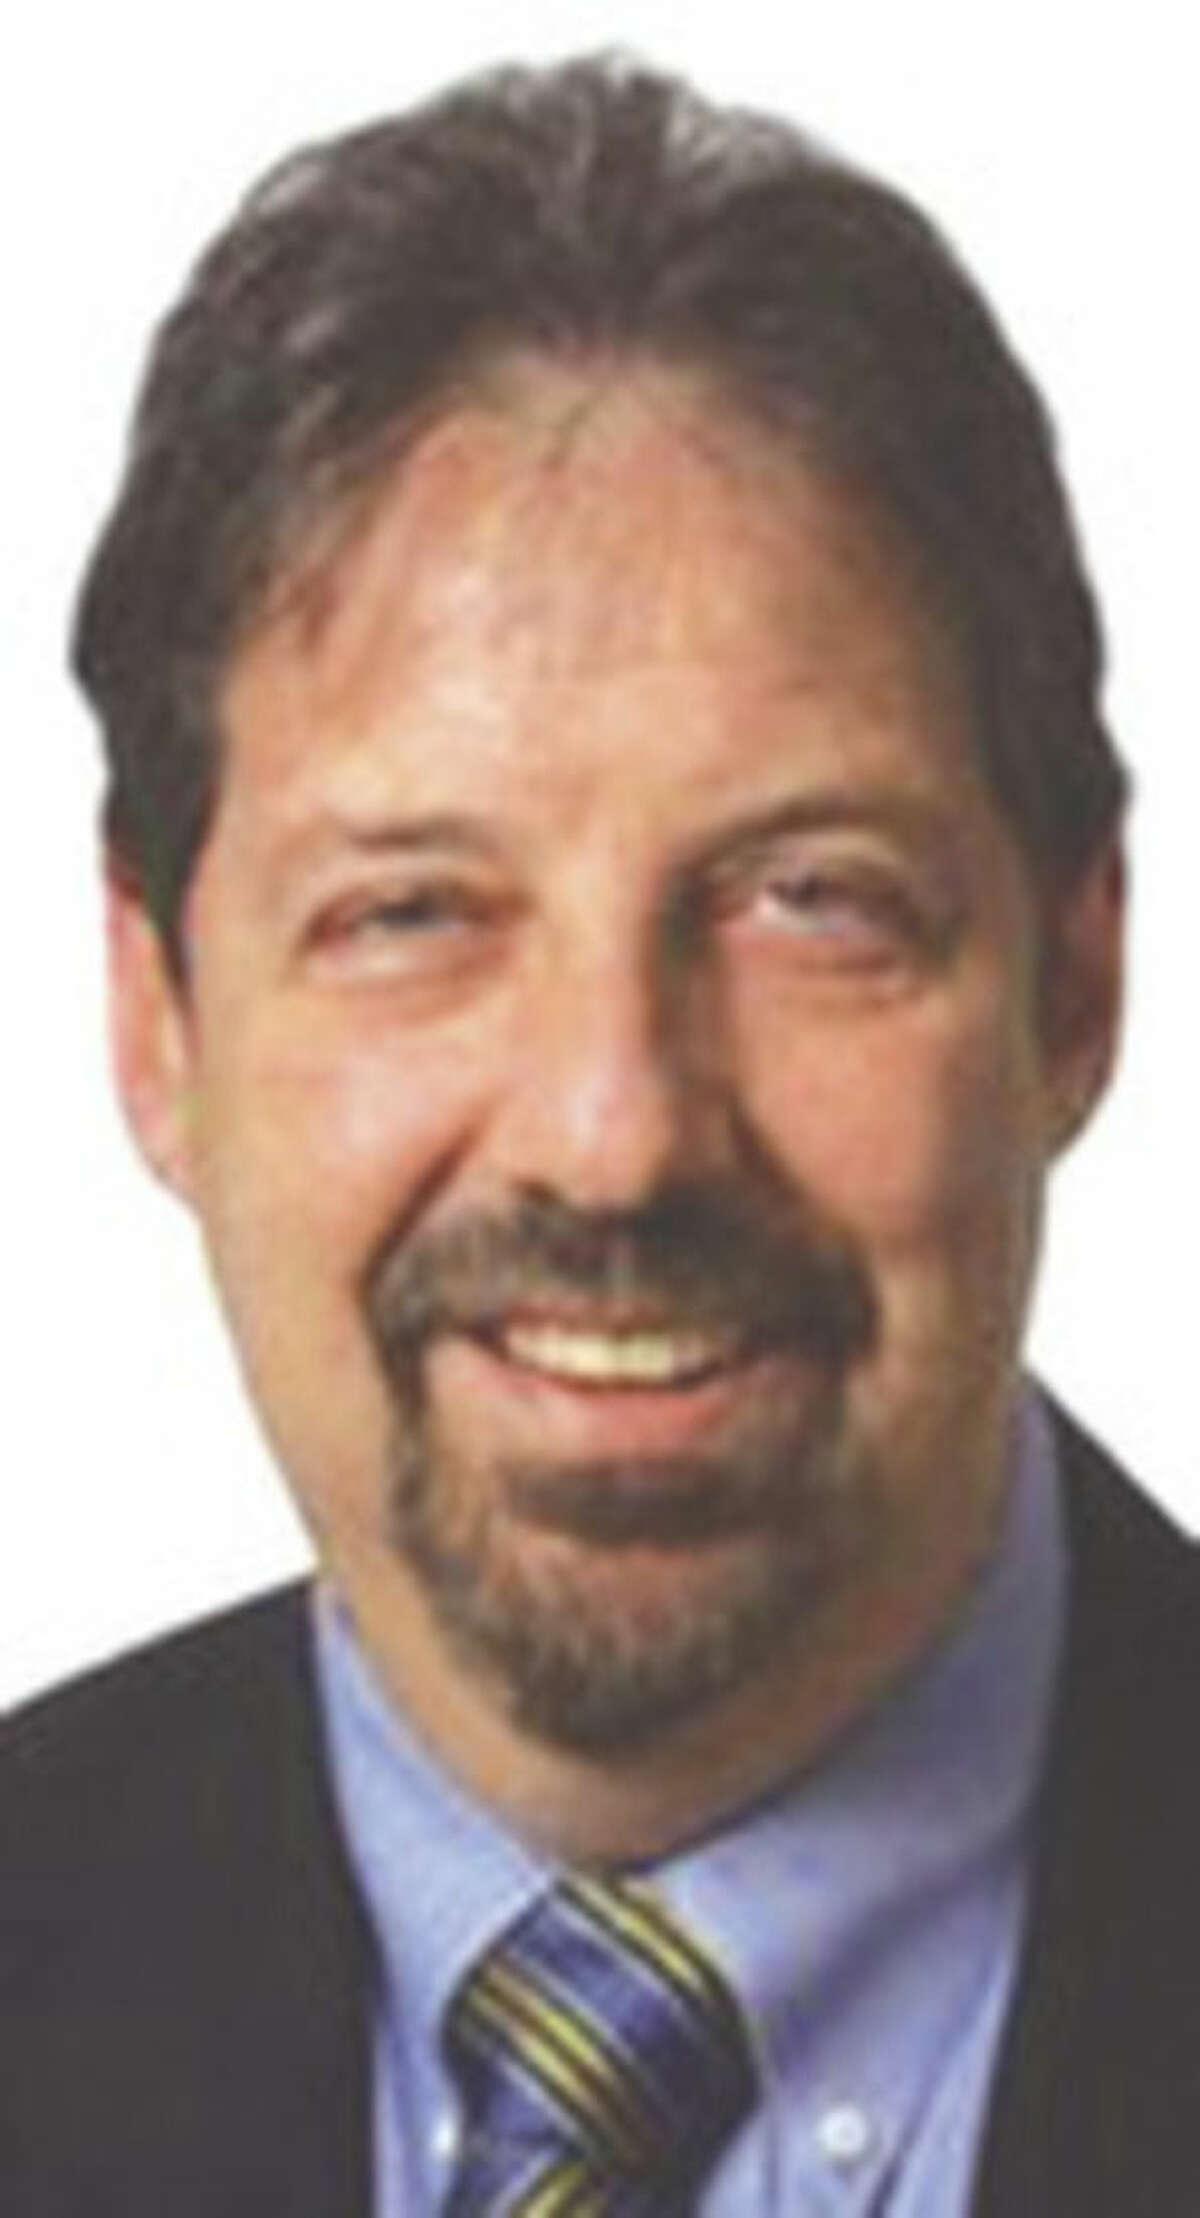 Dr. Michael Schwartz Soundview Medical Associates 50 Old Kings Highway North Darien, CT 06820 (203) 662 - 9333 (office) (203) 662 - 9313 (fax) www.drmichaelbschwartz.com